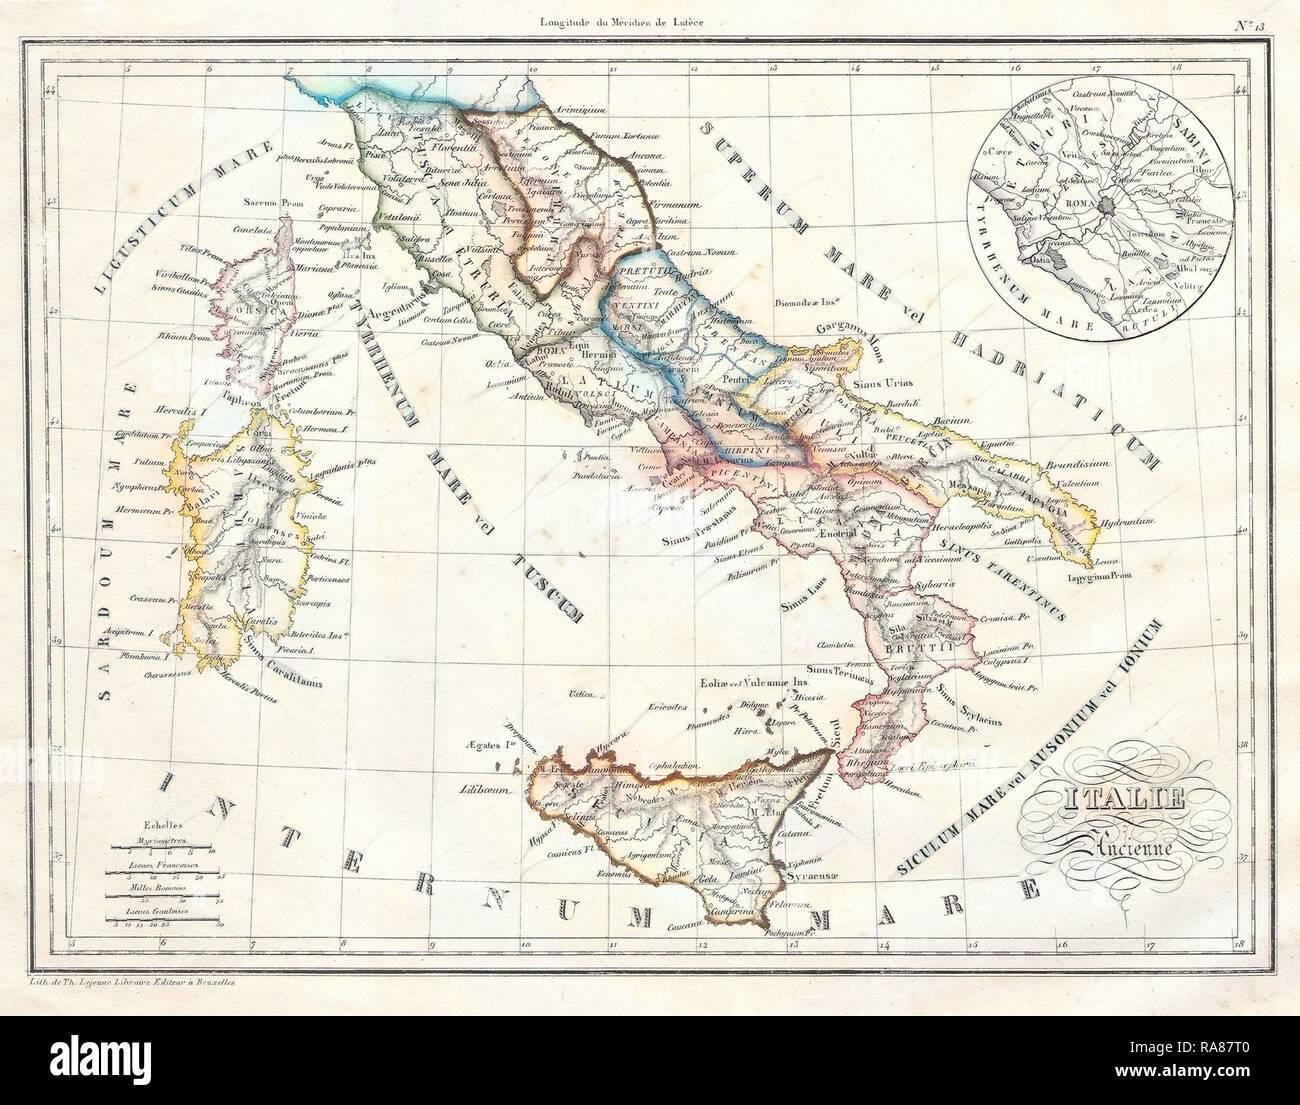 Cartina Italia Romana.Mappa Antica D Italia Immagini E Fotos Stock Alamy